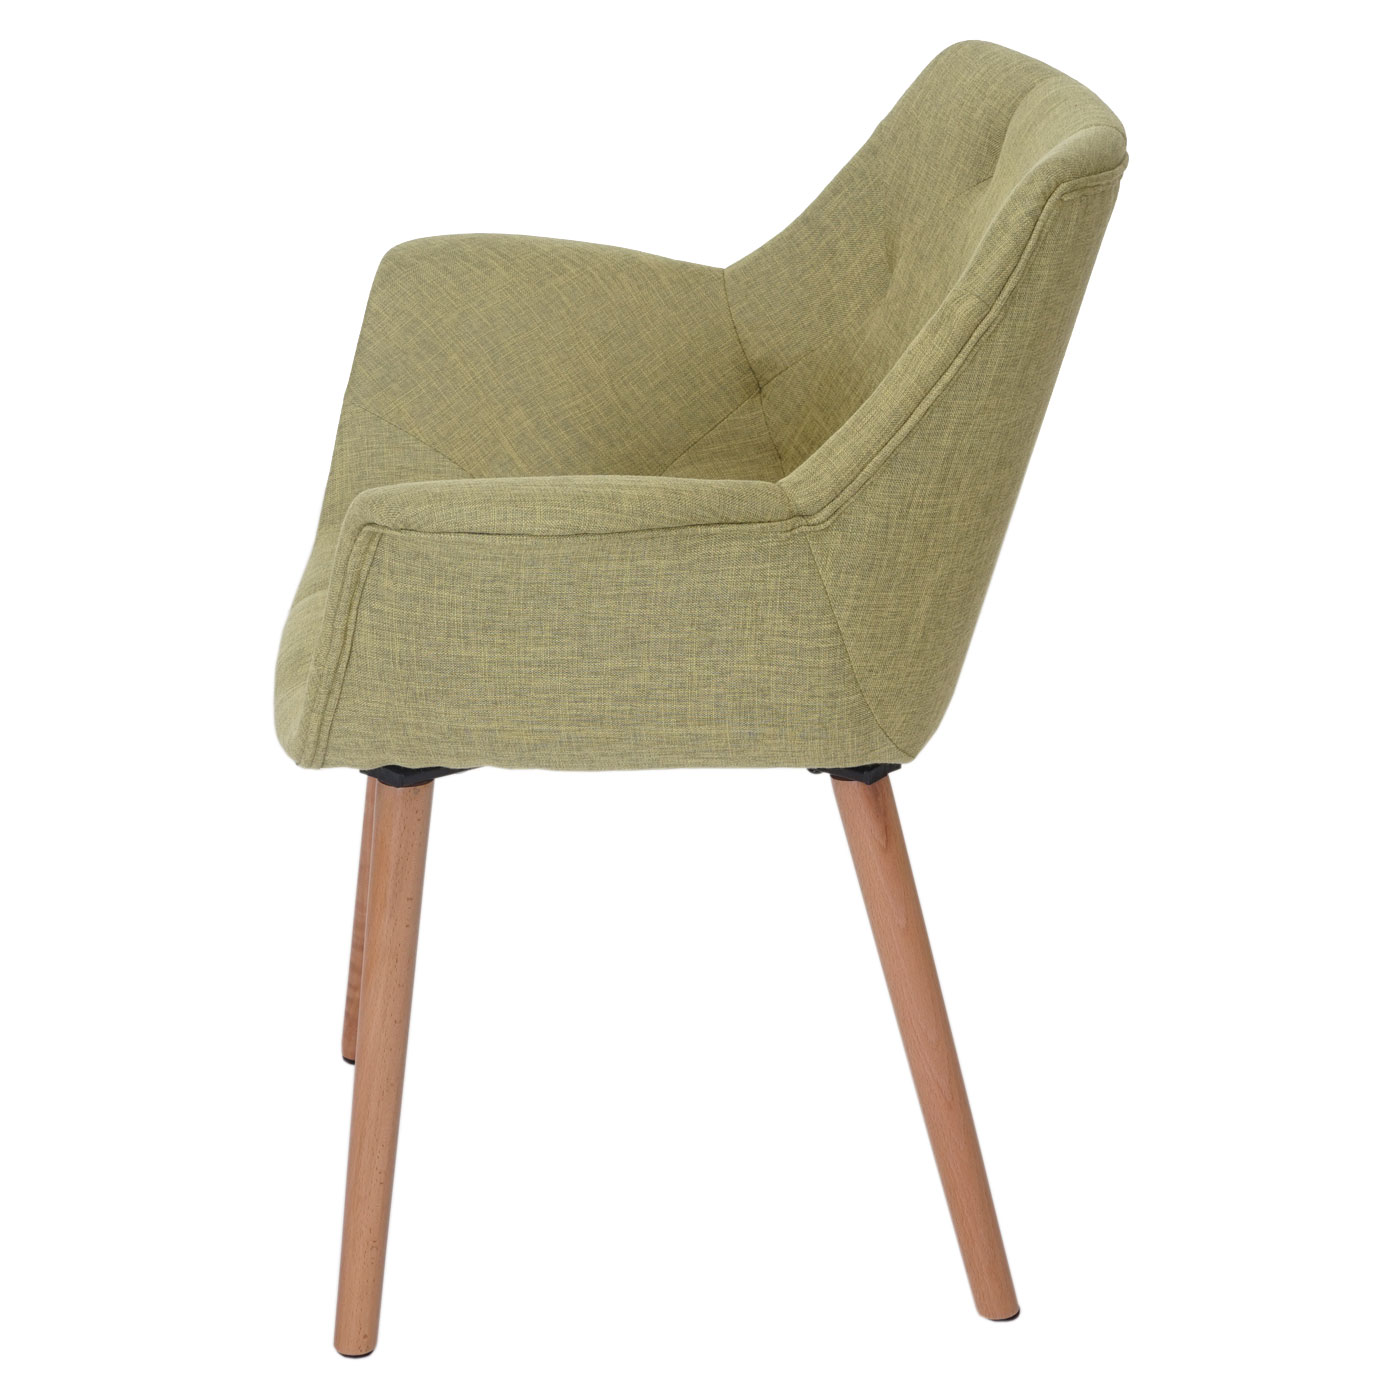 2x esszimmerstuhl malm t820 stuhl lehnstuhl retro 50er for Stuhl design geschichte